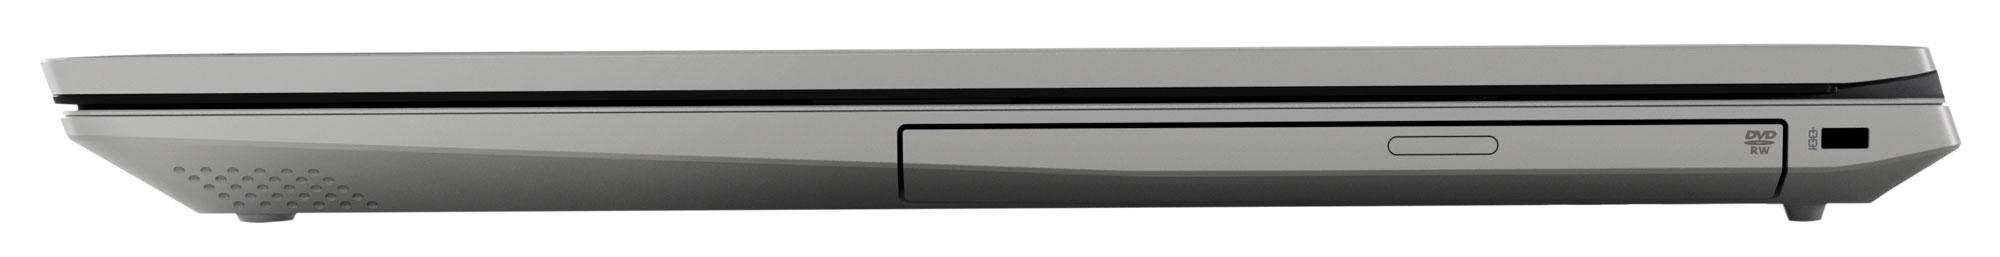 Фото  Ноутбук Lenovo ideapad L340-17API Platinum Grey (81LY003PRE)